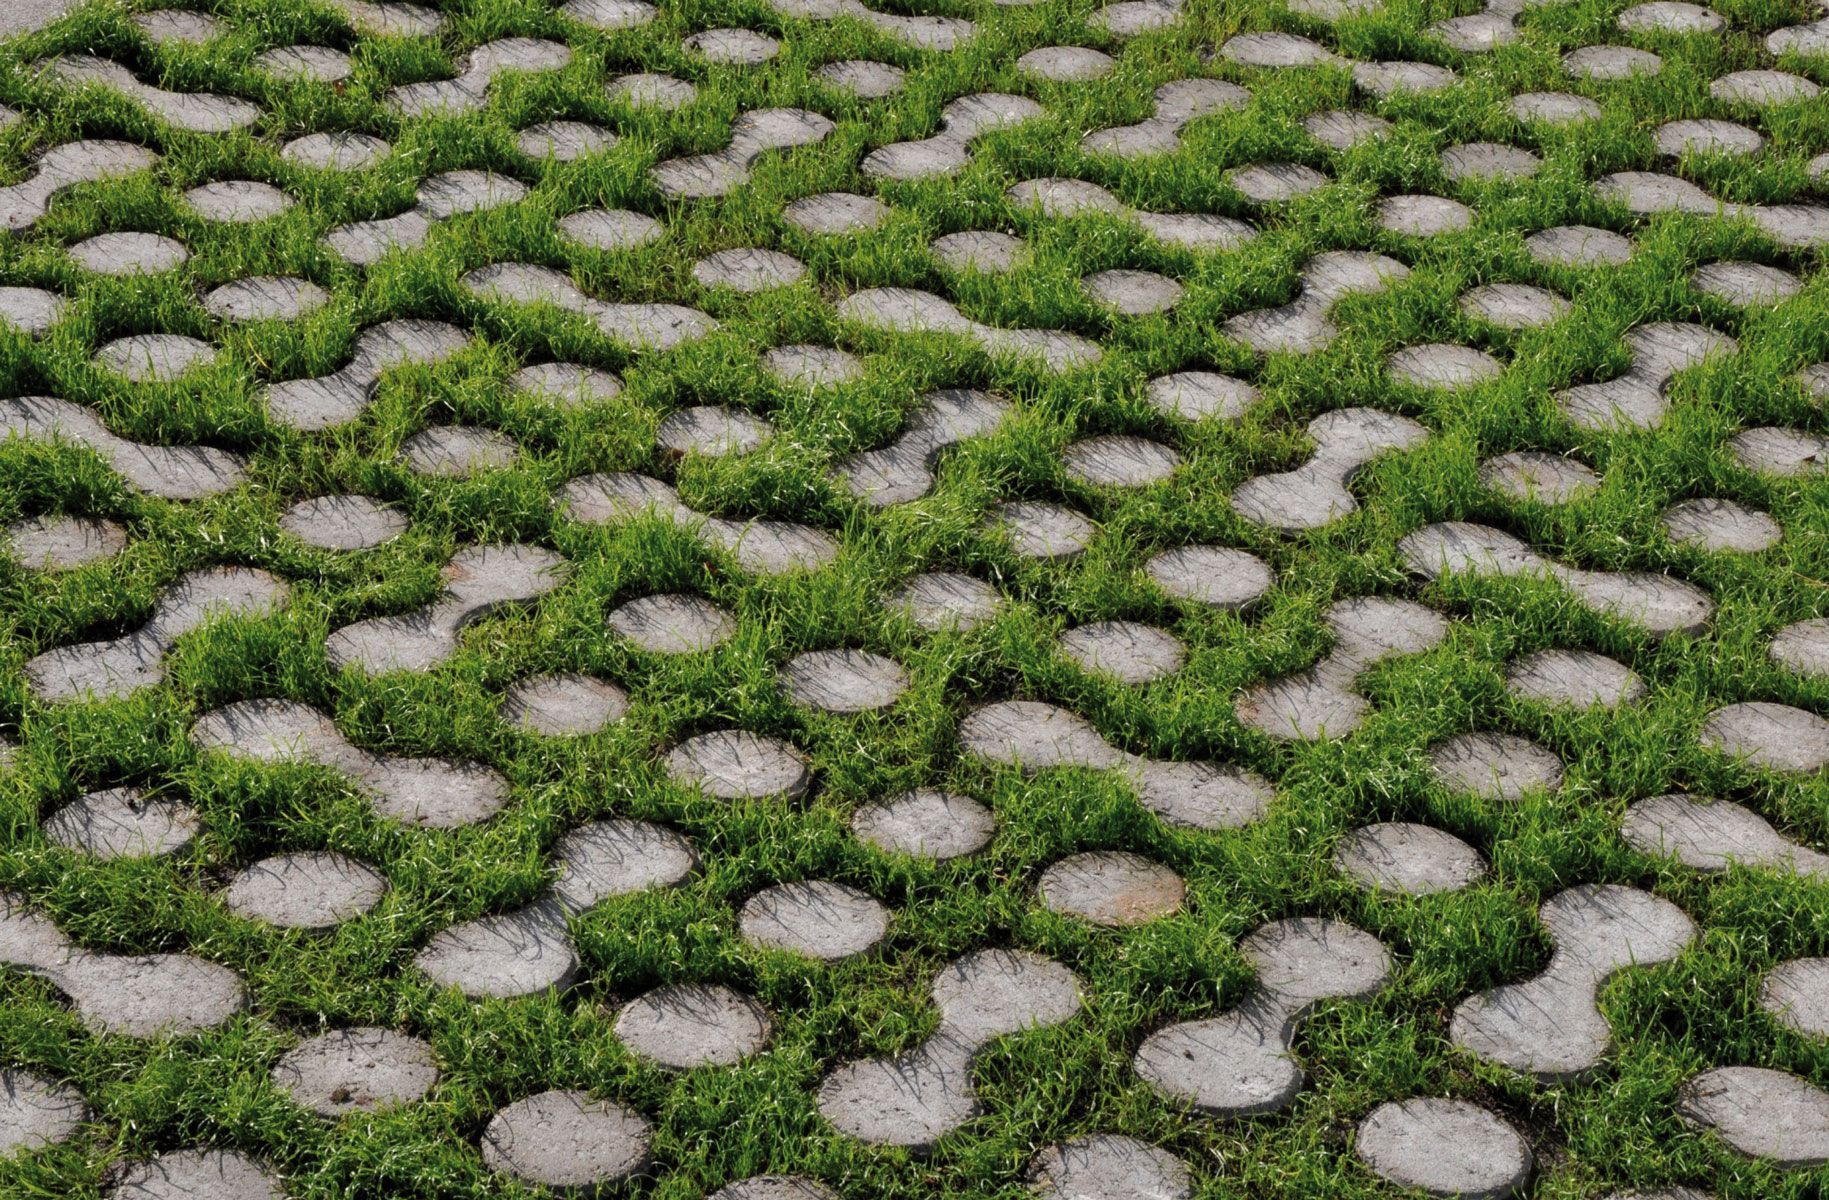 Epingle Sur Jardins Paysage